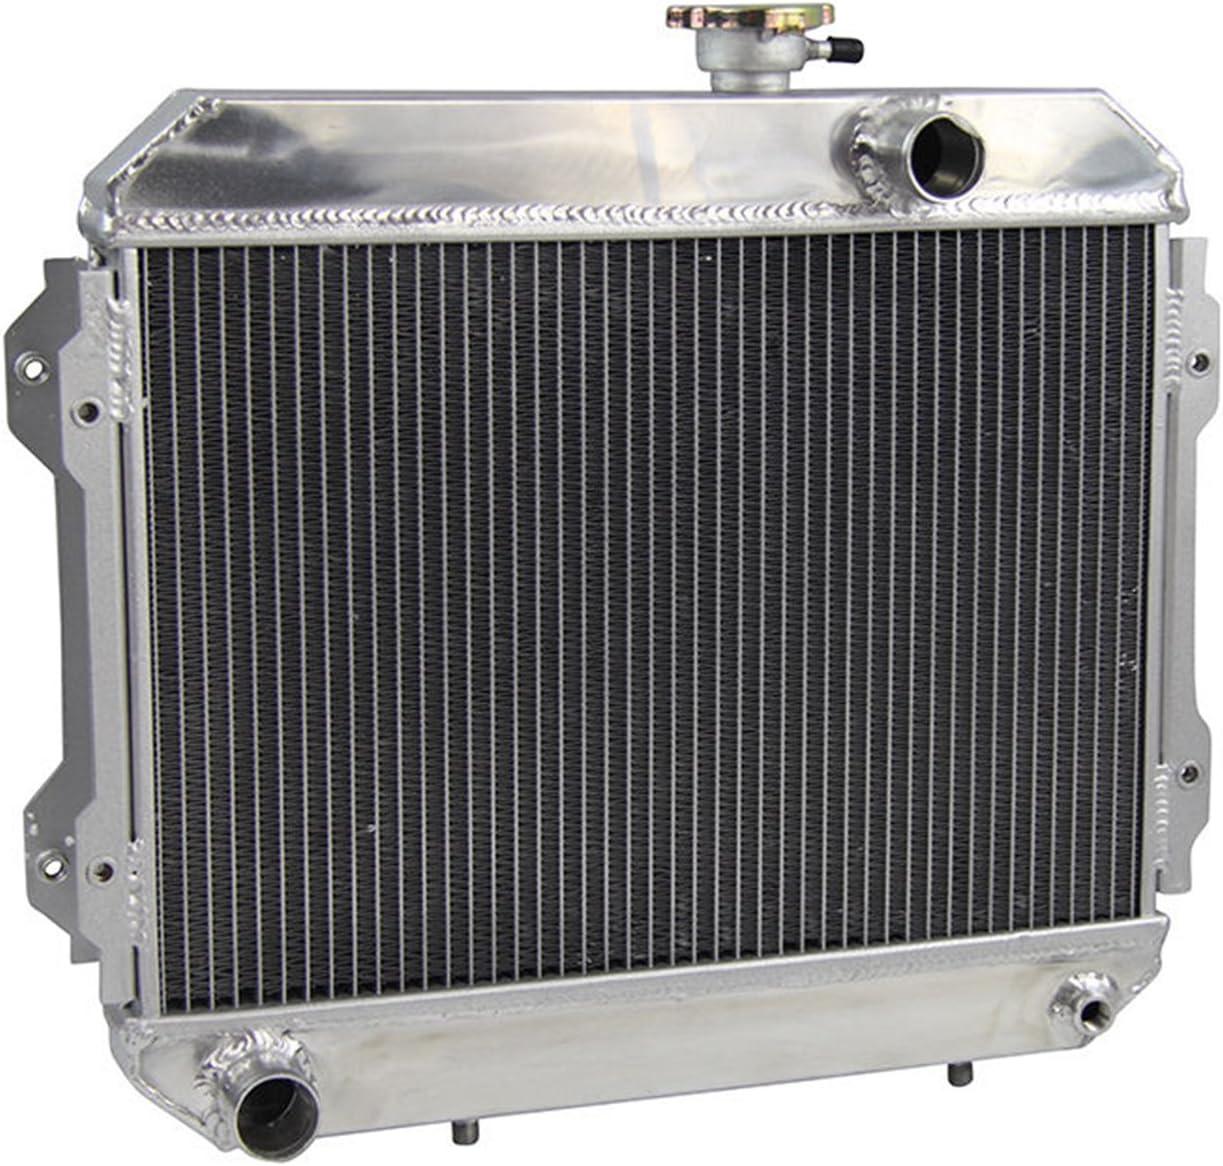 Fit to TOYOTA COROLLA KE30 KE35 KE38 KE55 KE70 1974-1985 Aluminum Radiator 1980